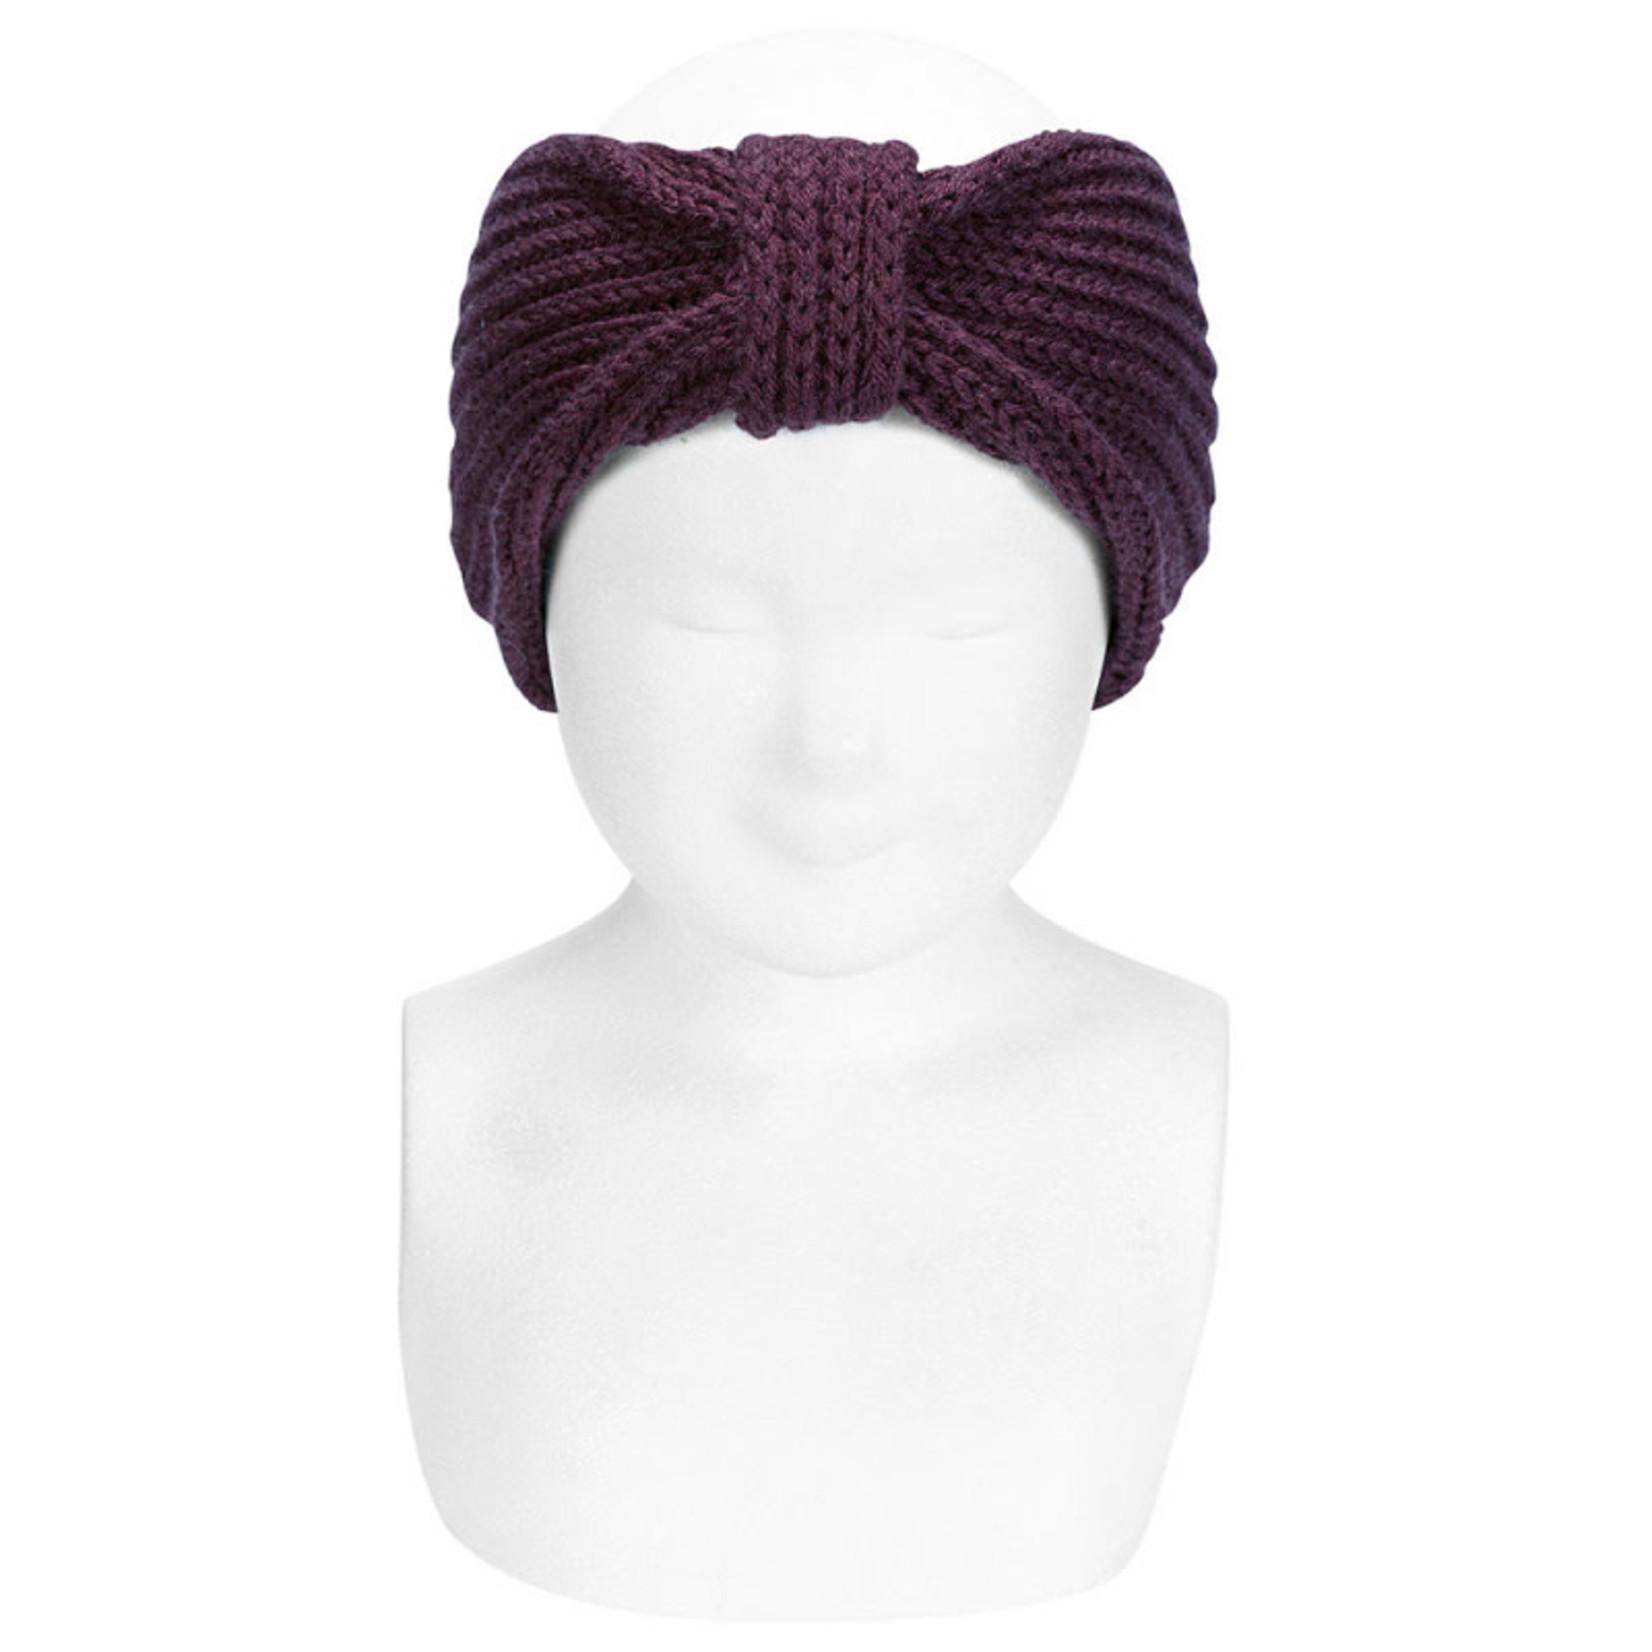 Condor Hair Turban - Dark Purple